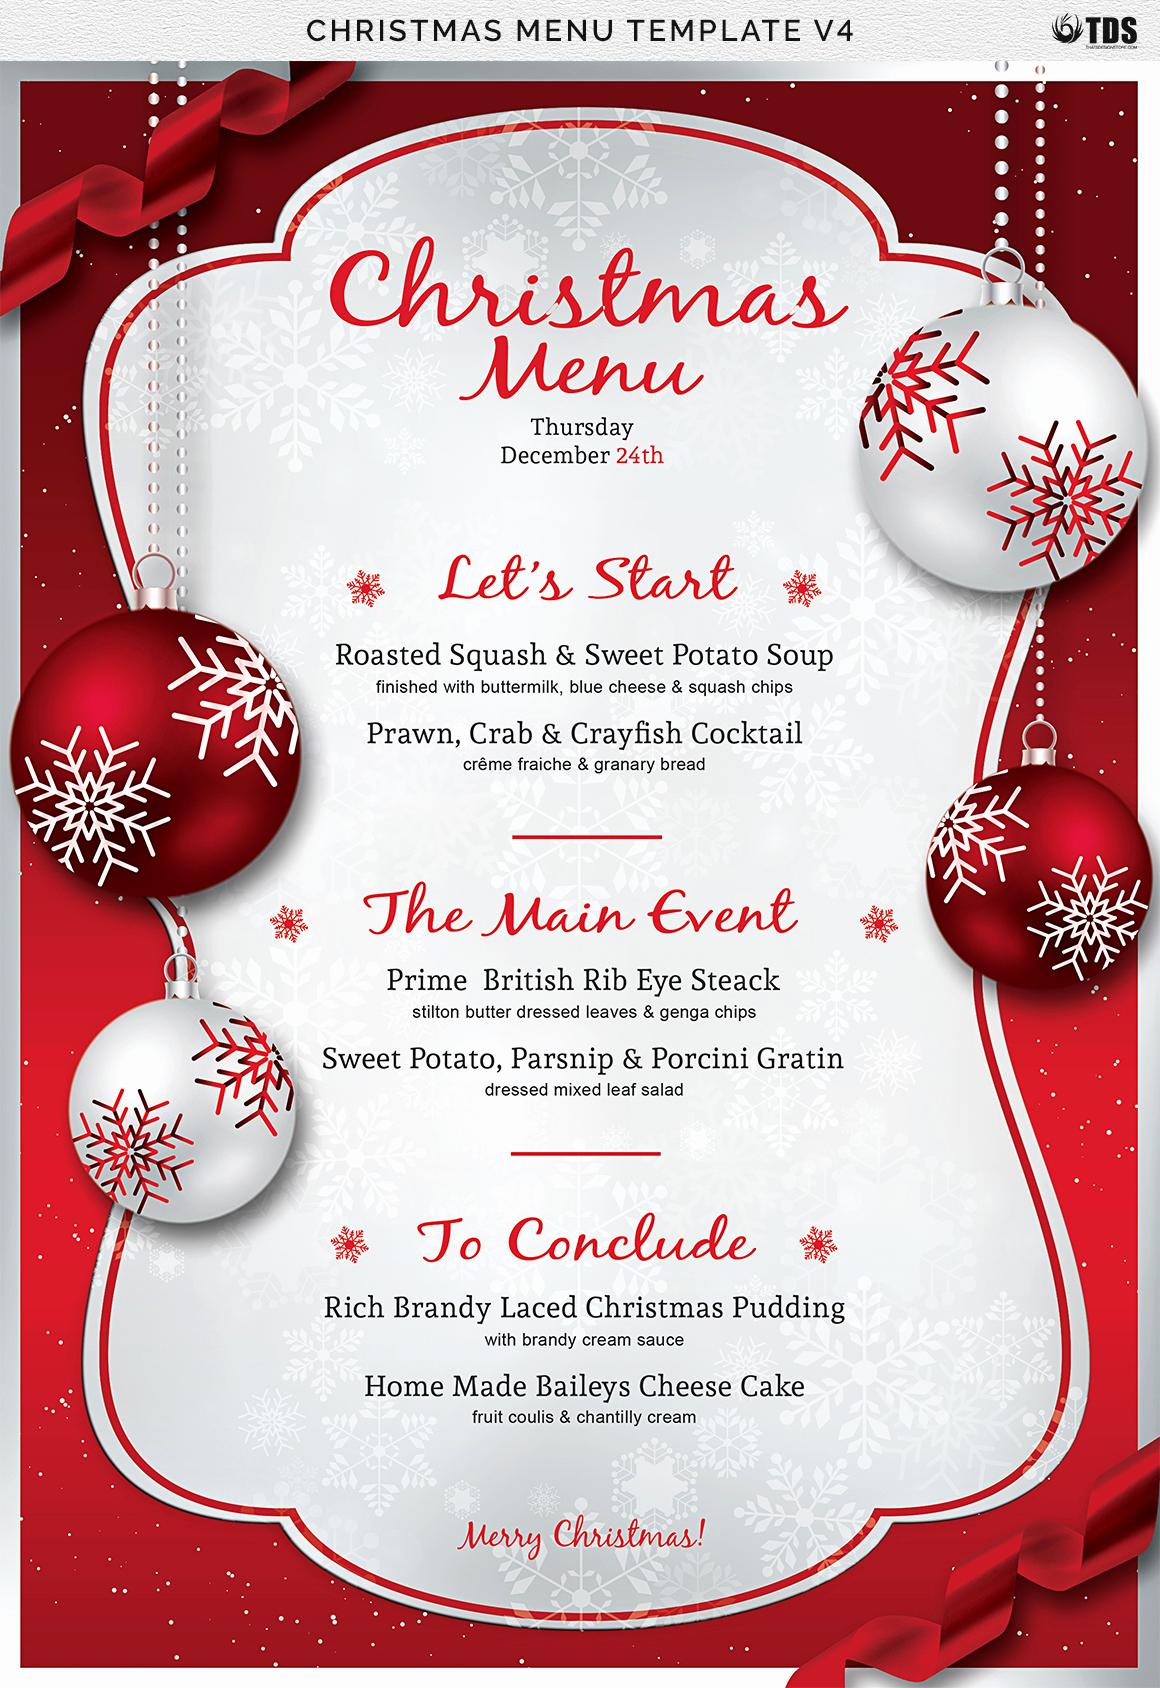 Free Menu Template Word Inspirational Christmas Menu Template V4